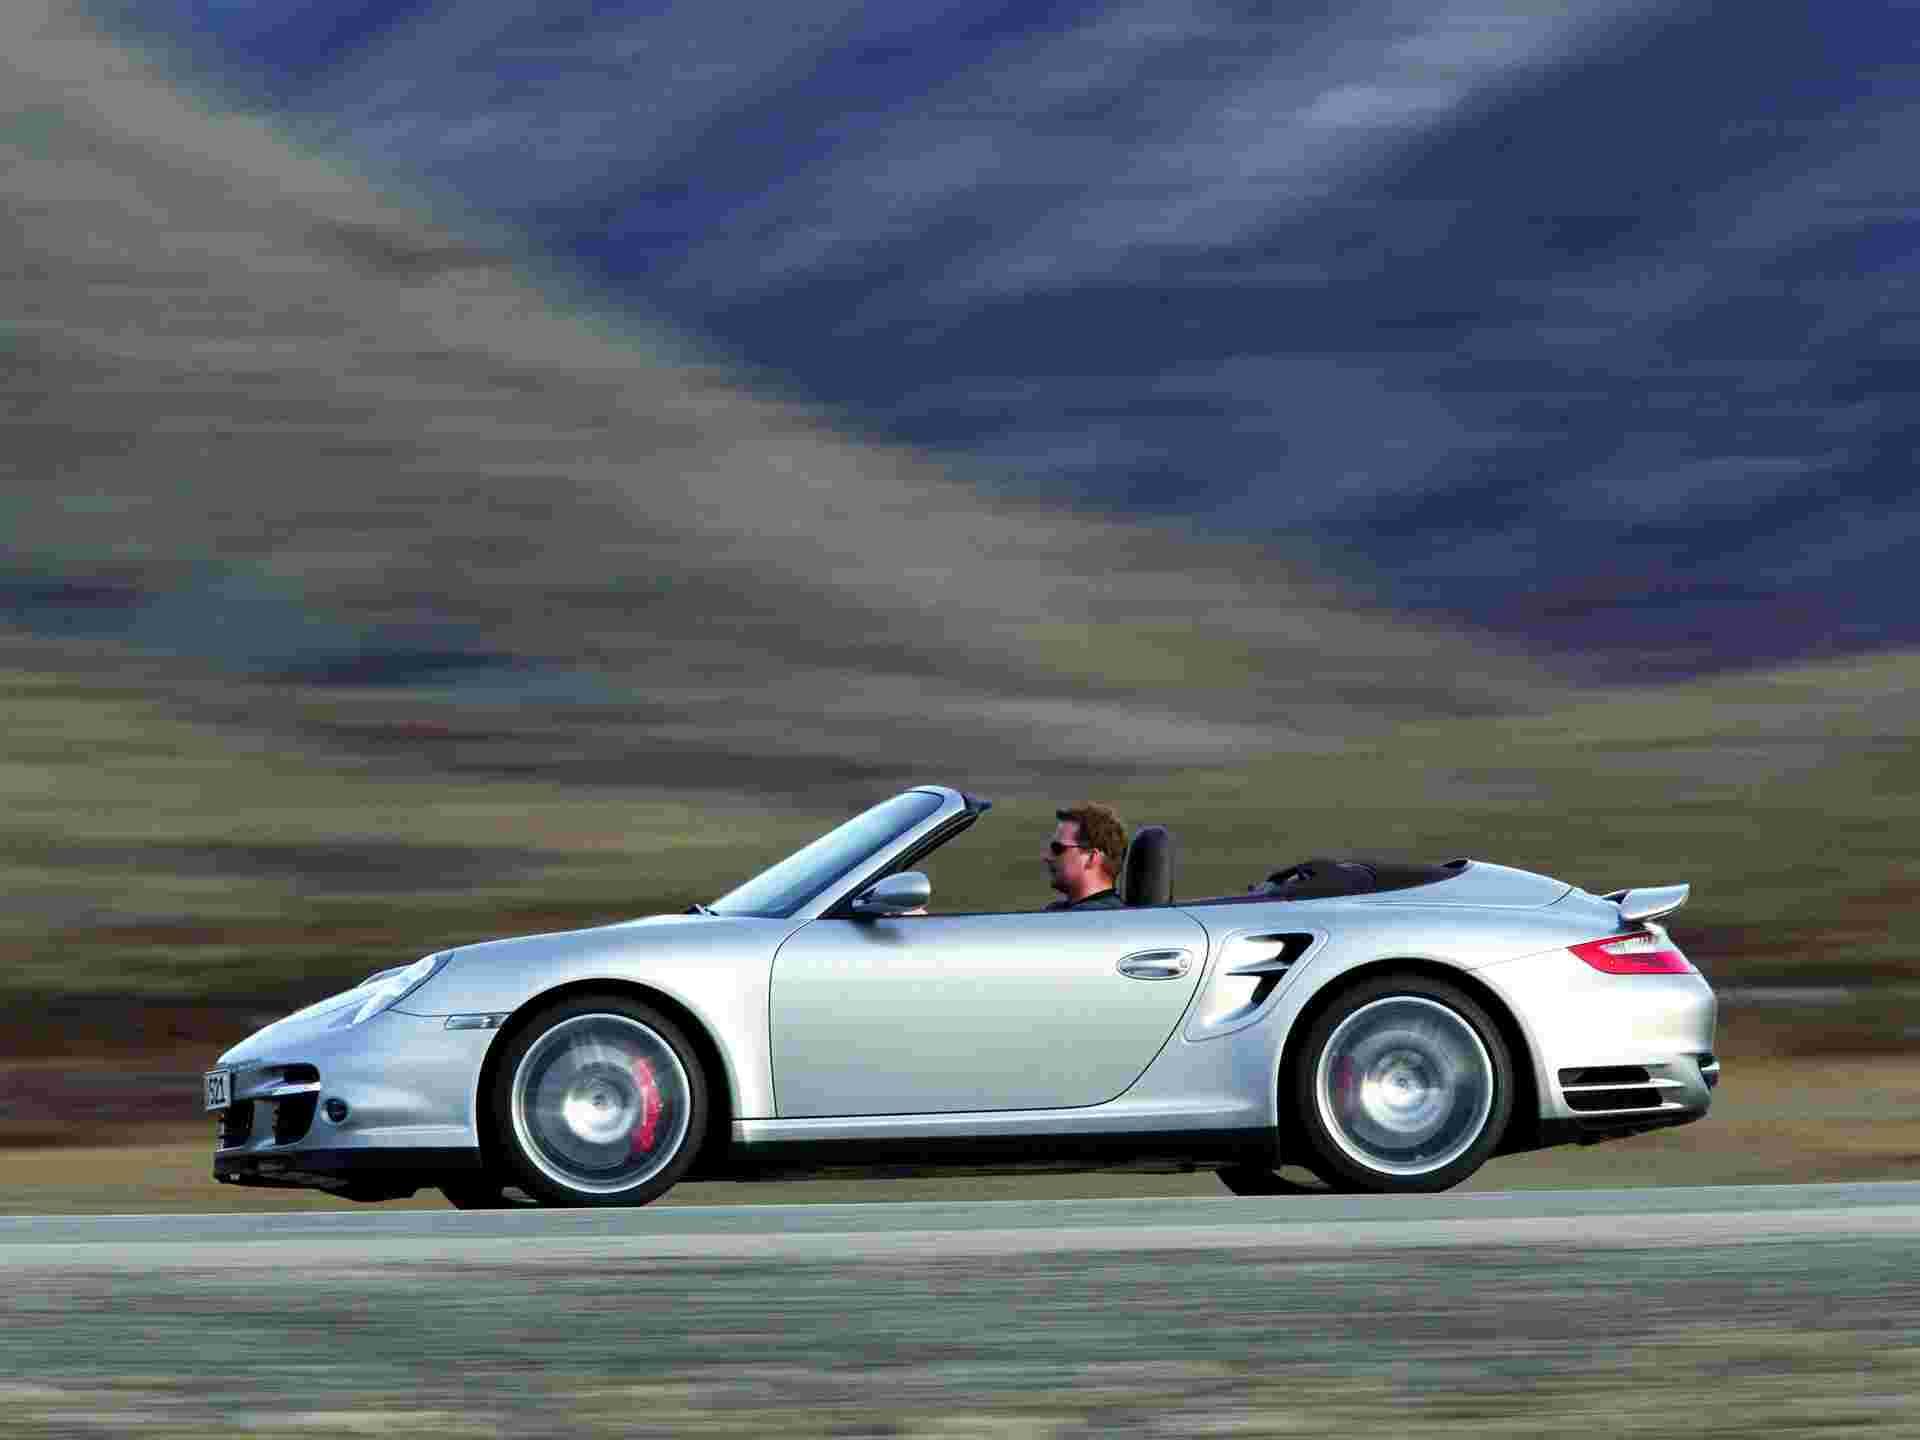 porsche 911 turbo cabriolet 16 wallpaper   Porsche   Auto Moto 1920x1440